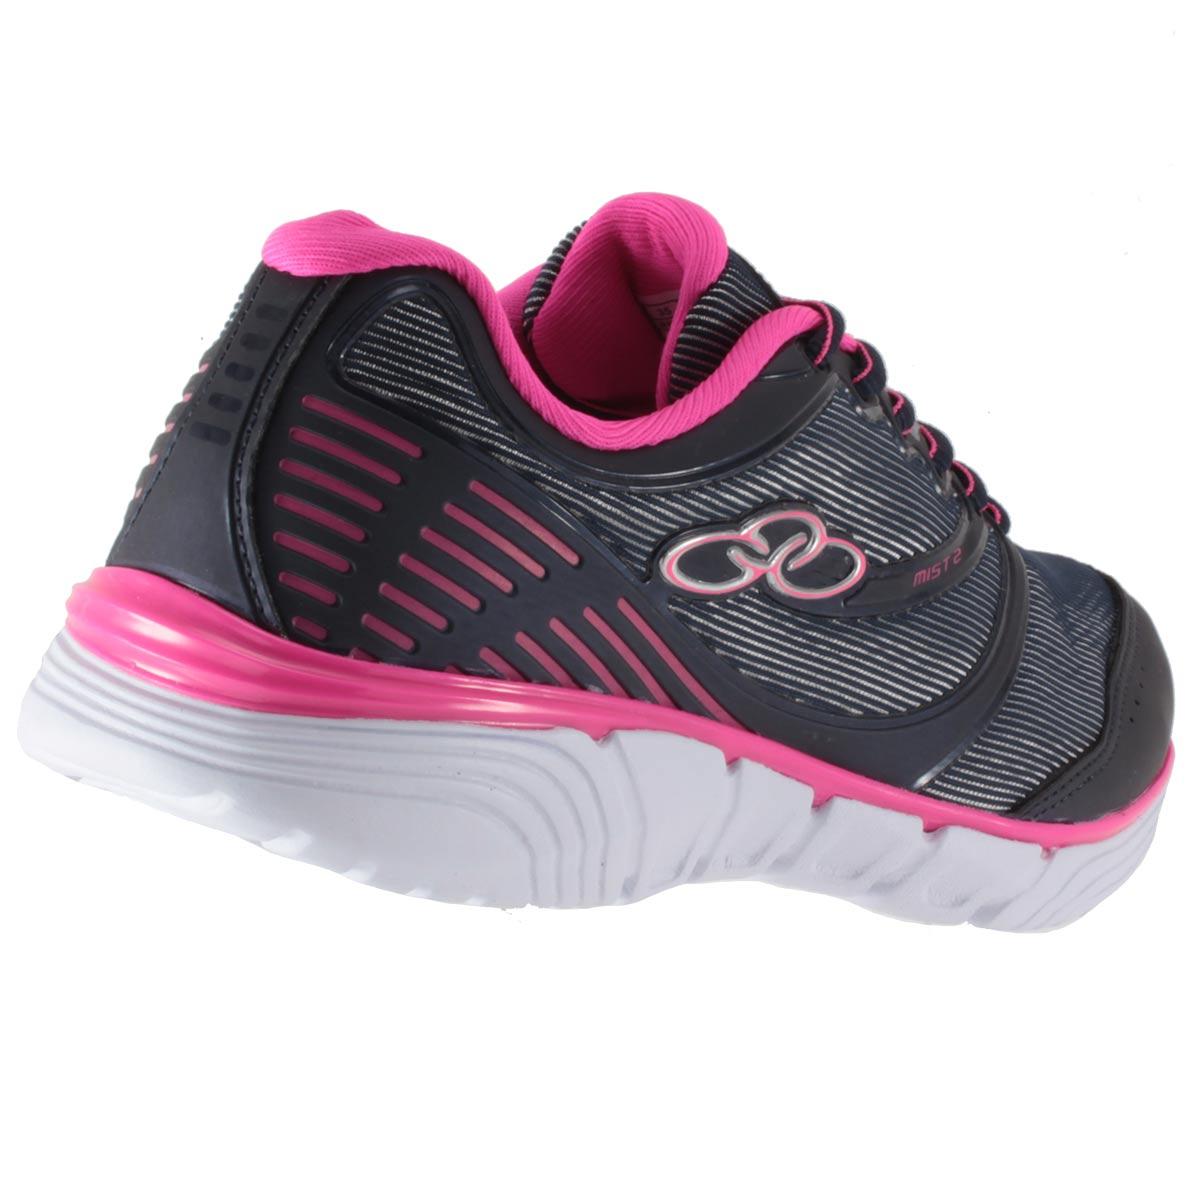 Tênis Olympikus Mist 2 Feminino Caminhada Corrida Running 344